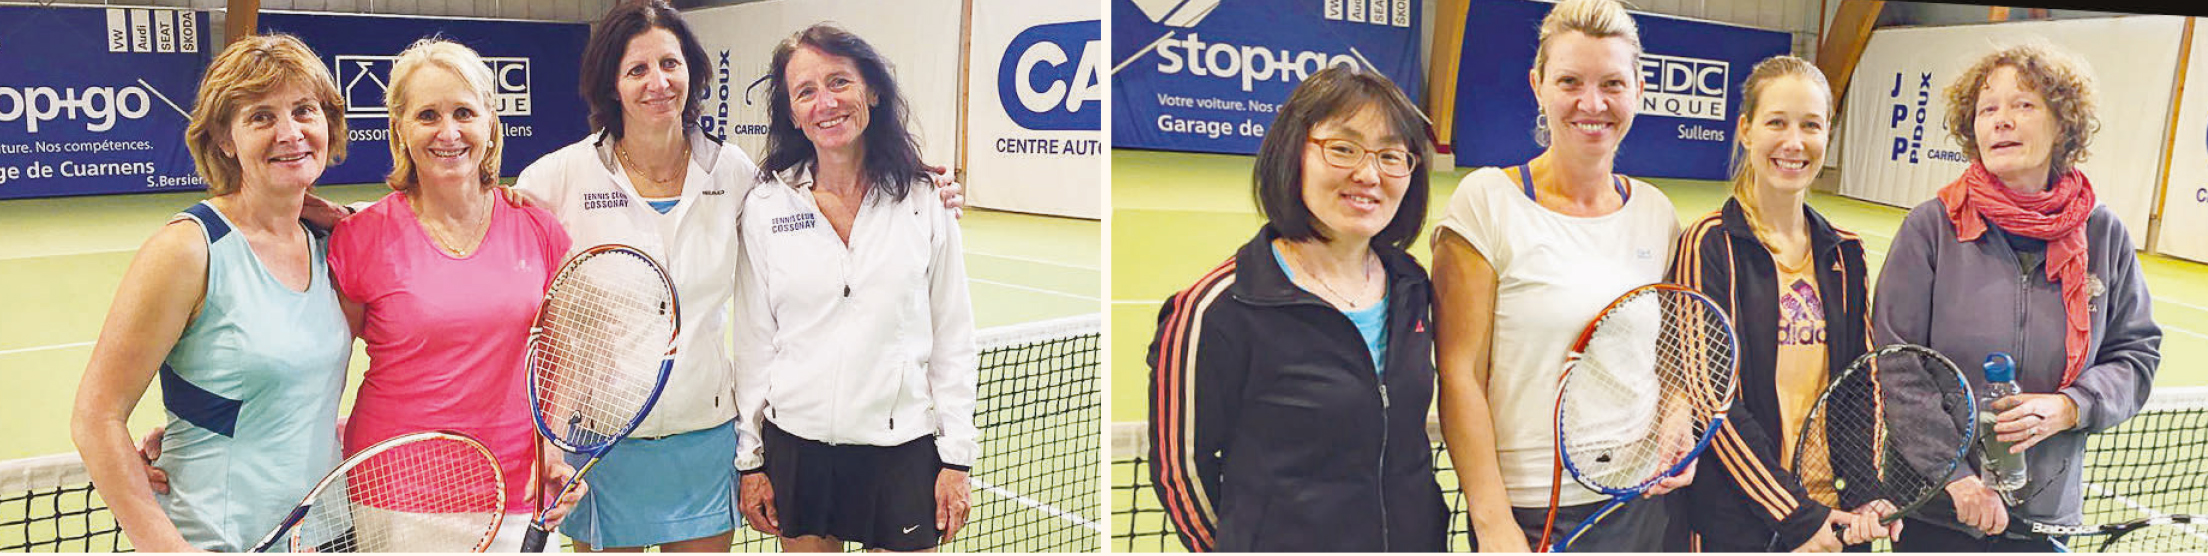 Tennis-Club de Cossonay – Les gagnantes de la 31e édition de la Coupe Franca